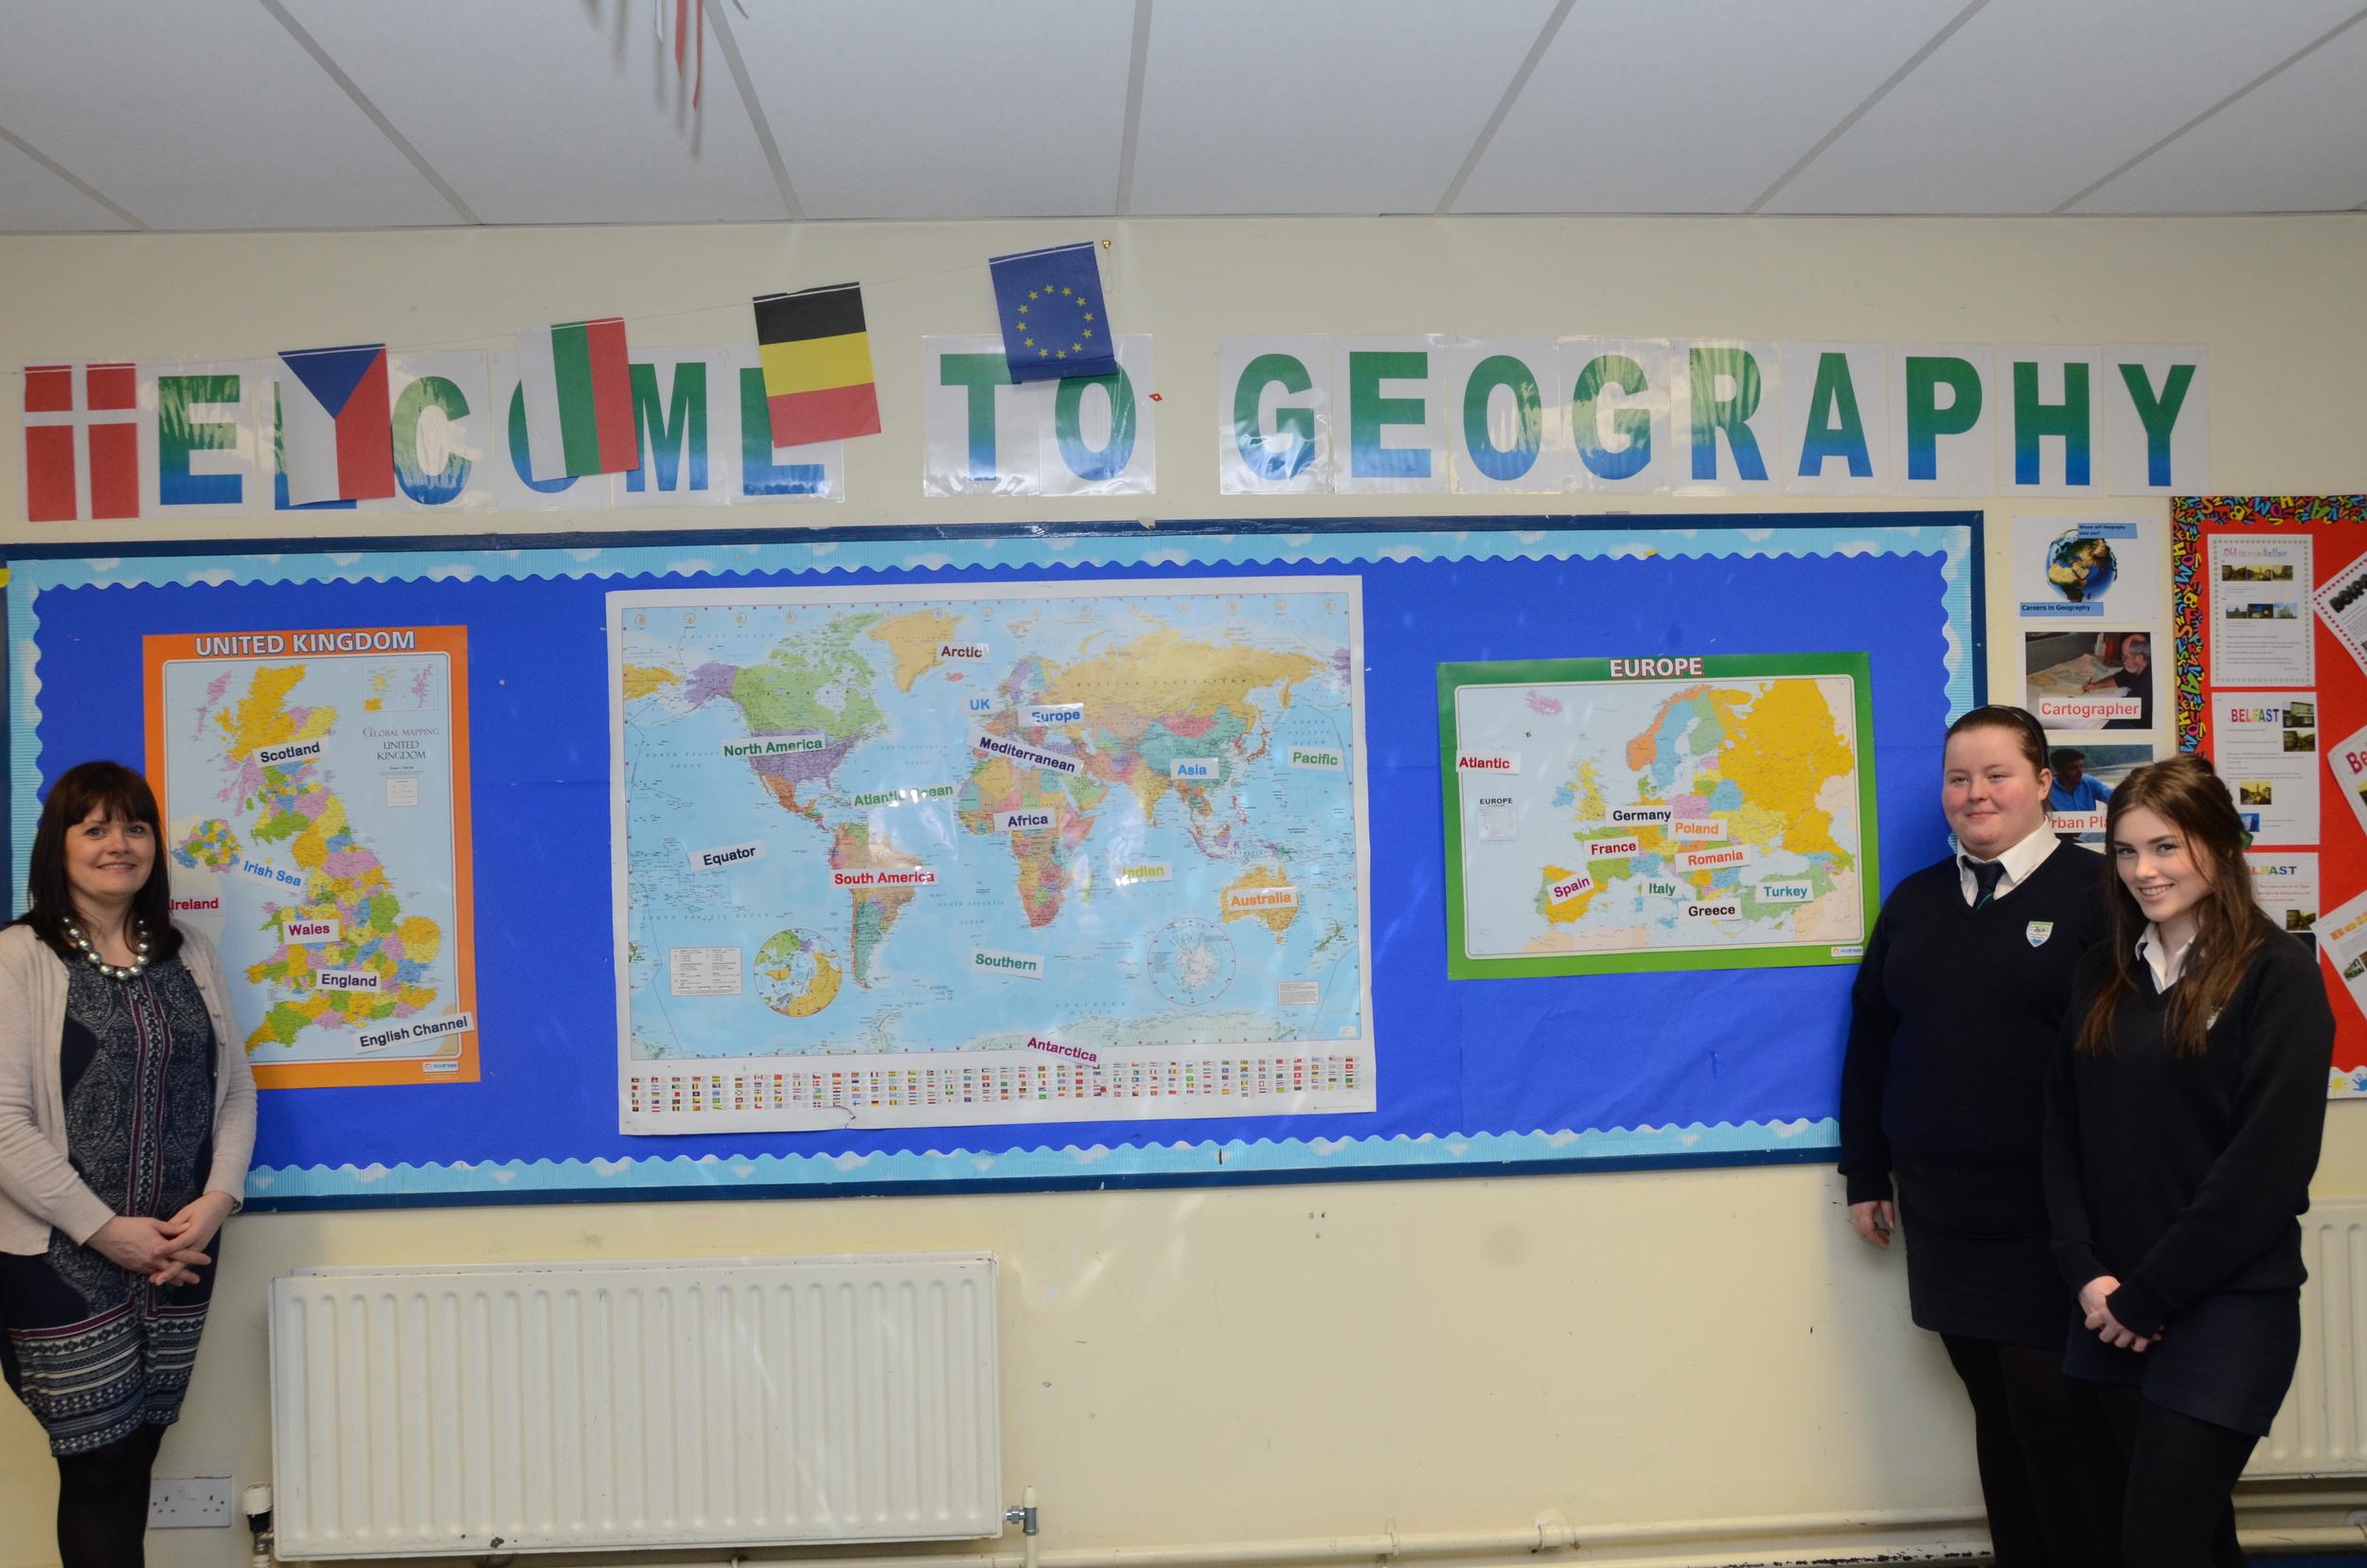 geographyiiew (3).JPG